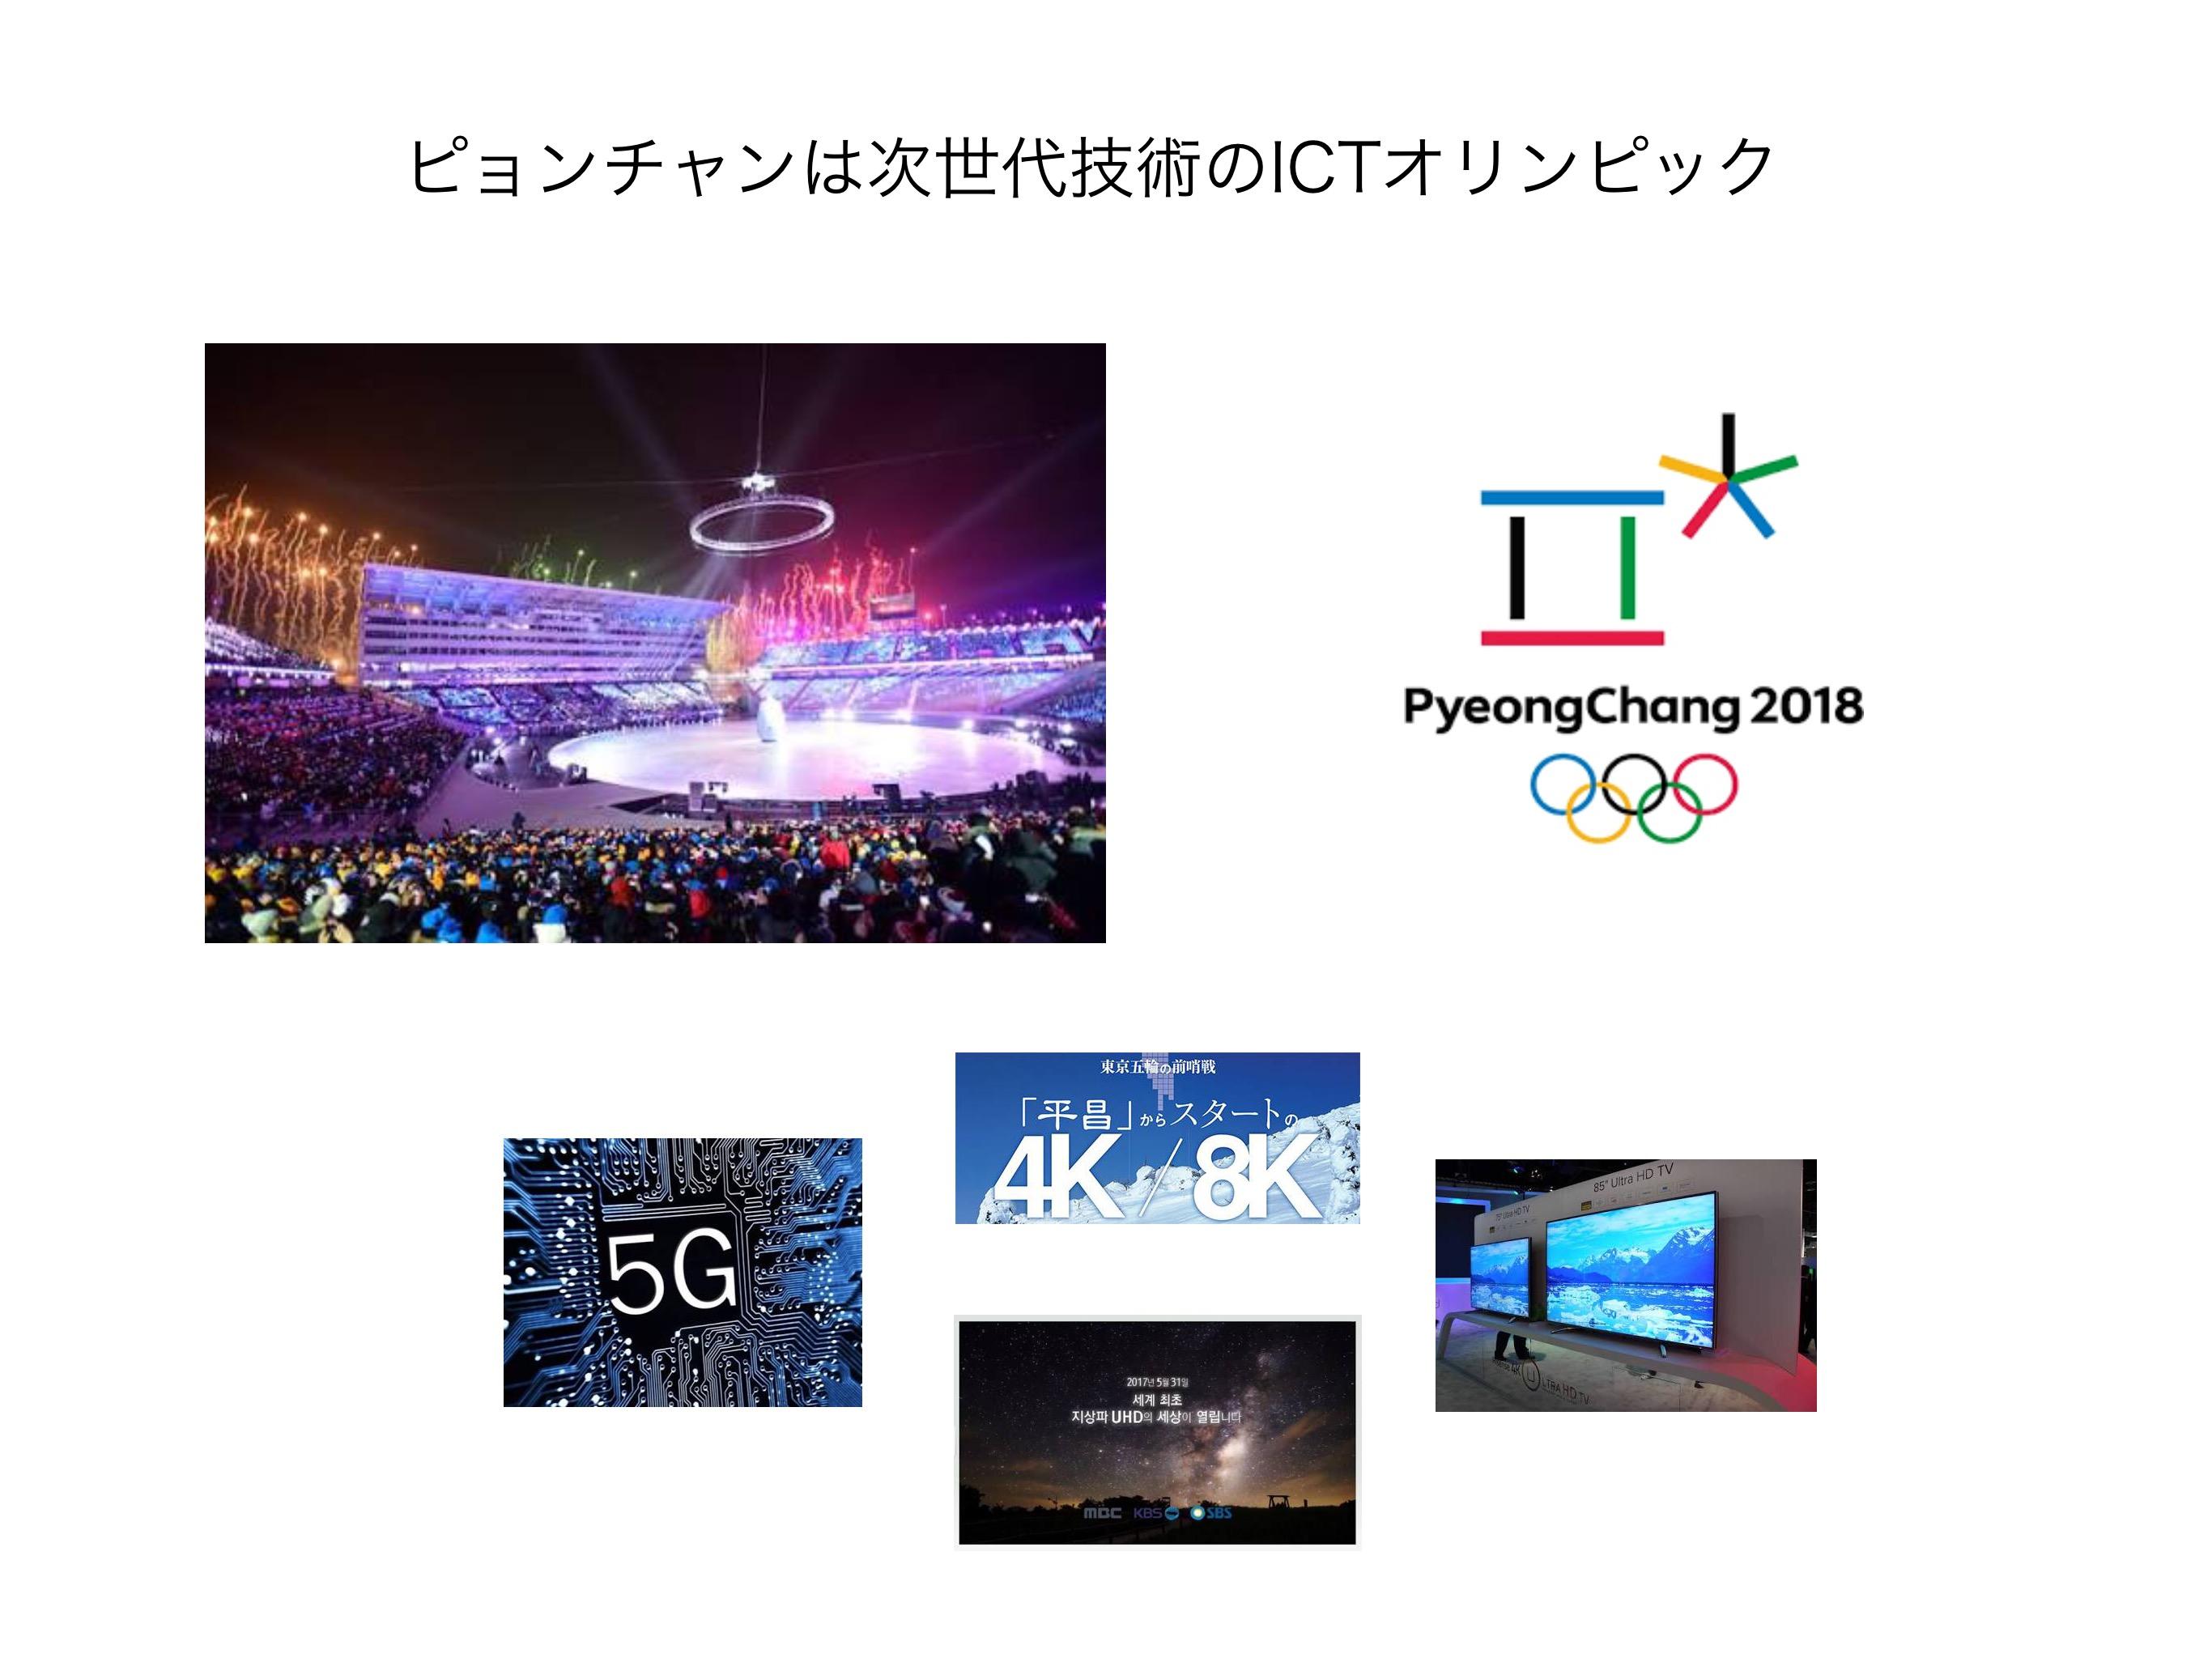 PyeongChang